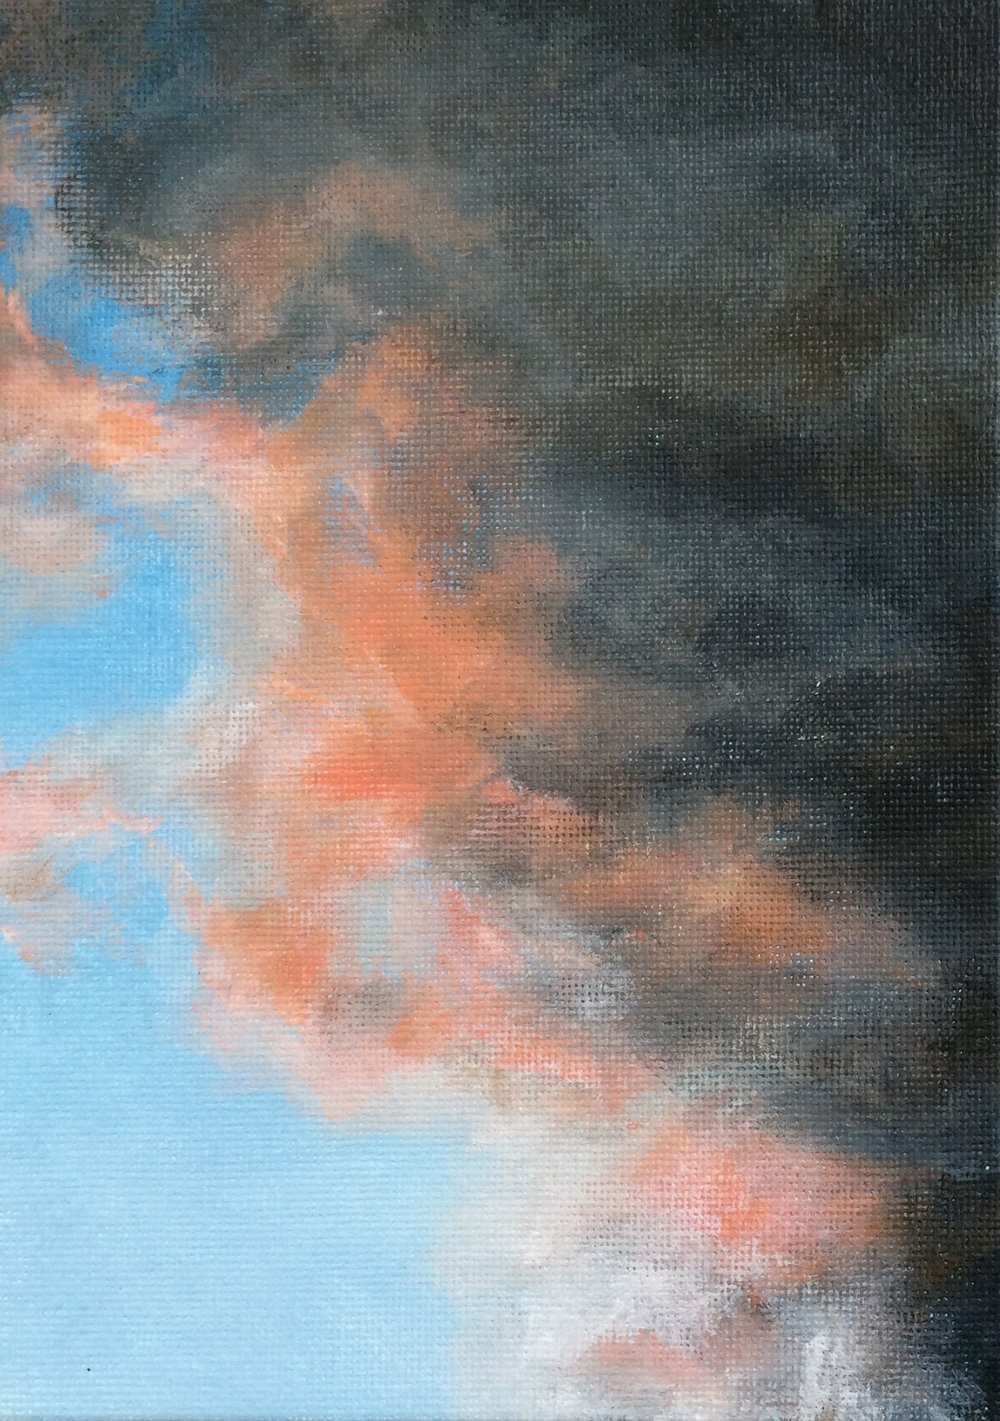 Clouds of Blush